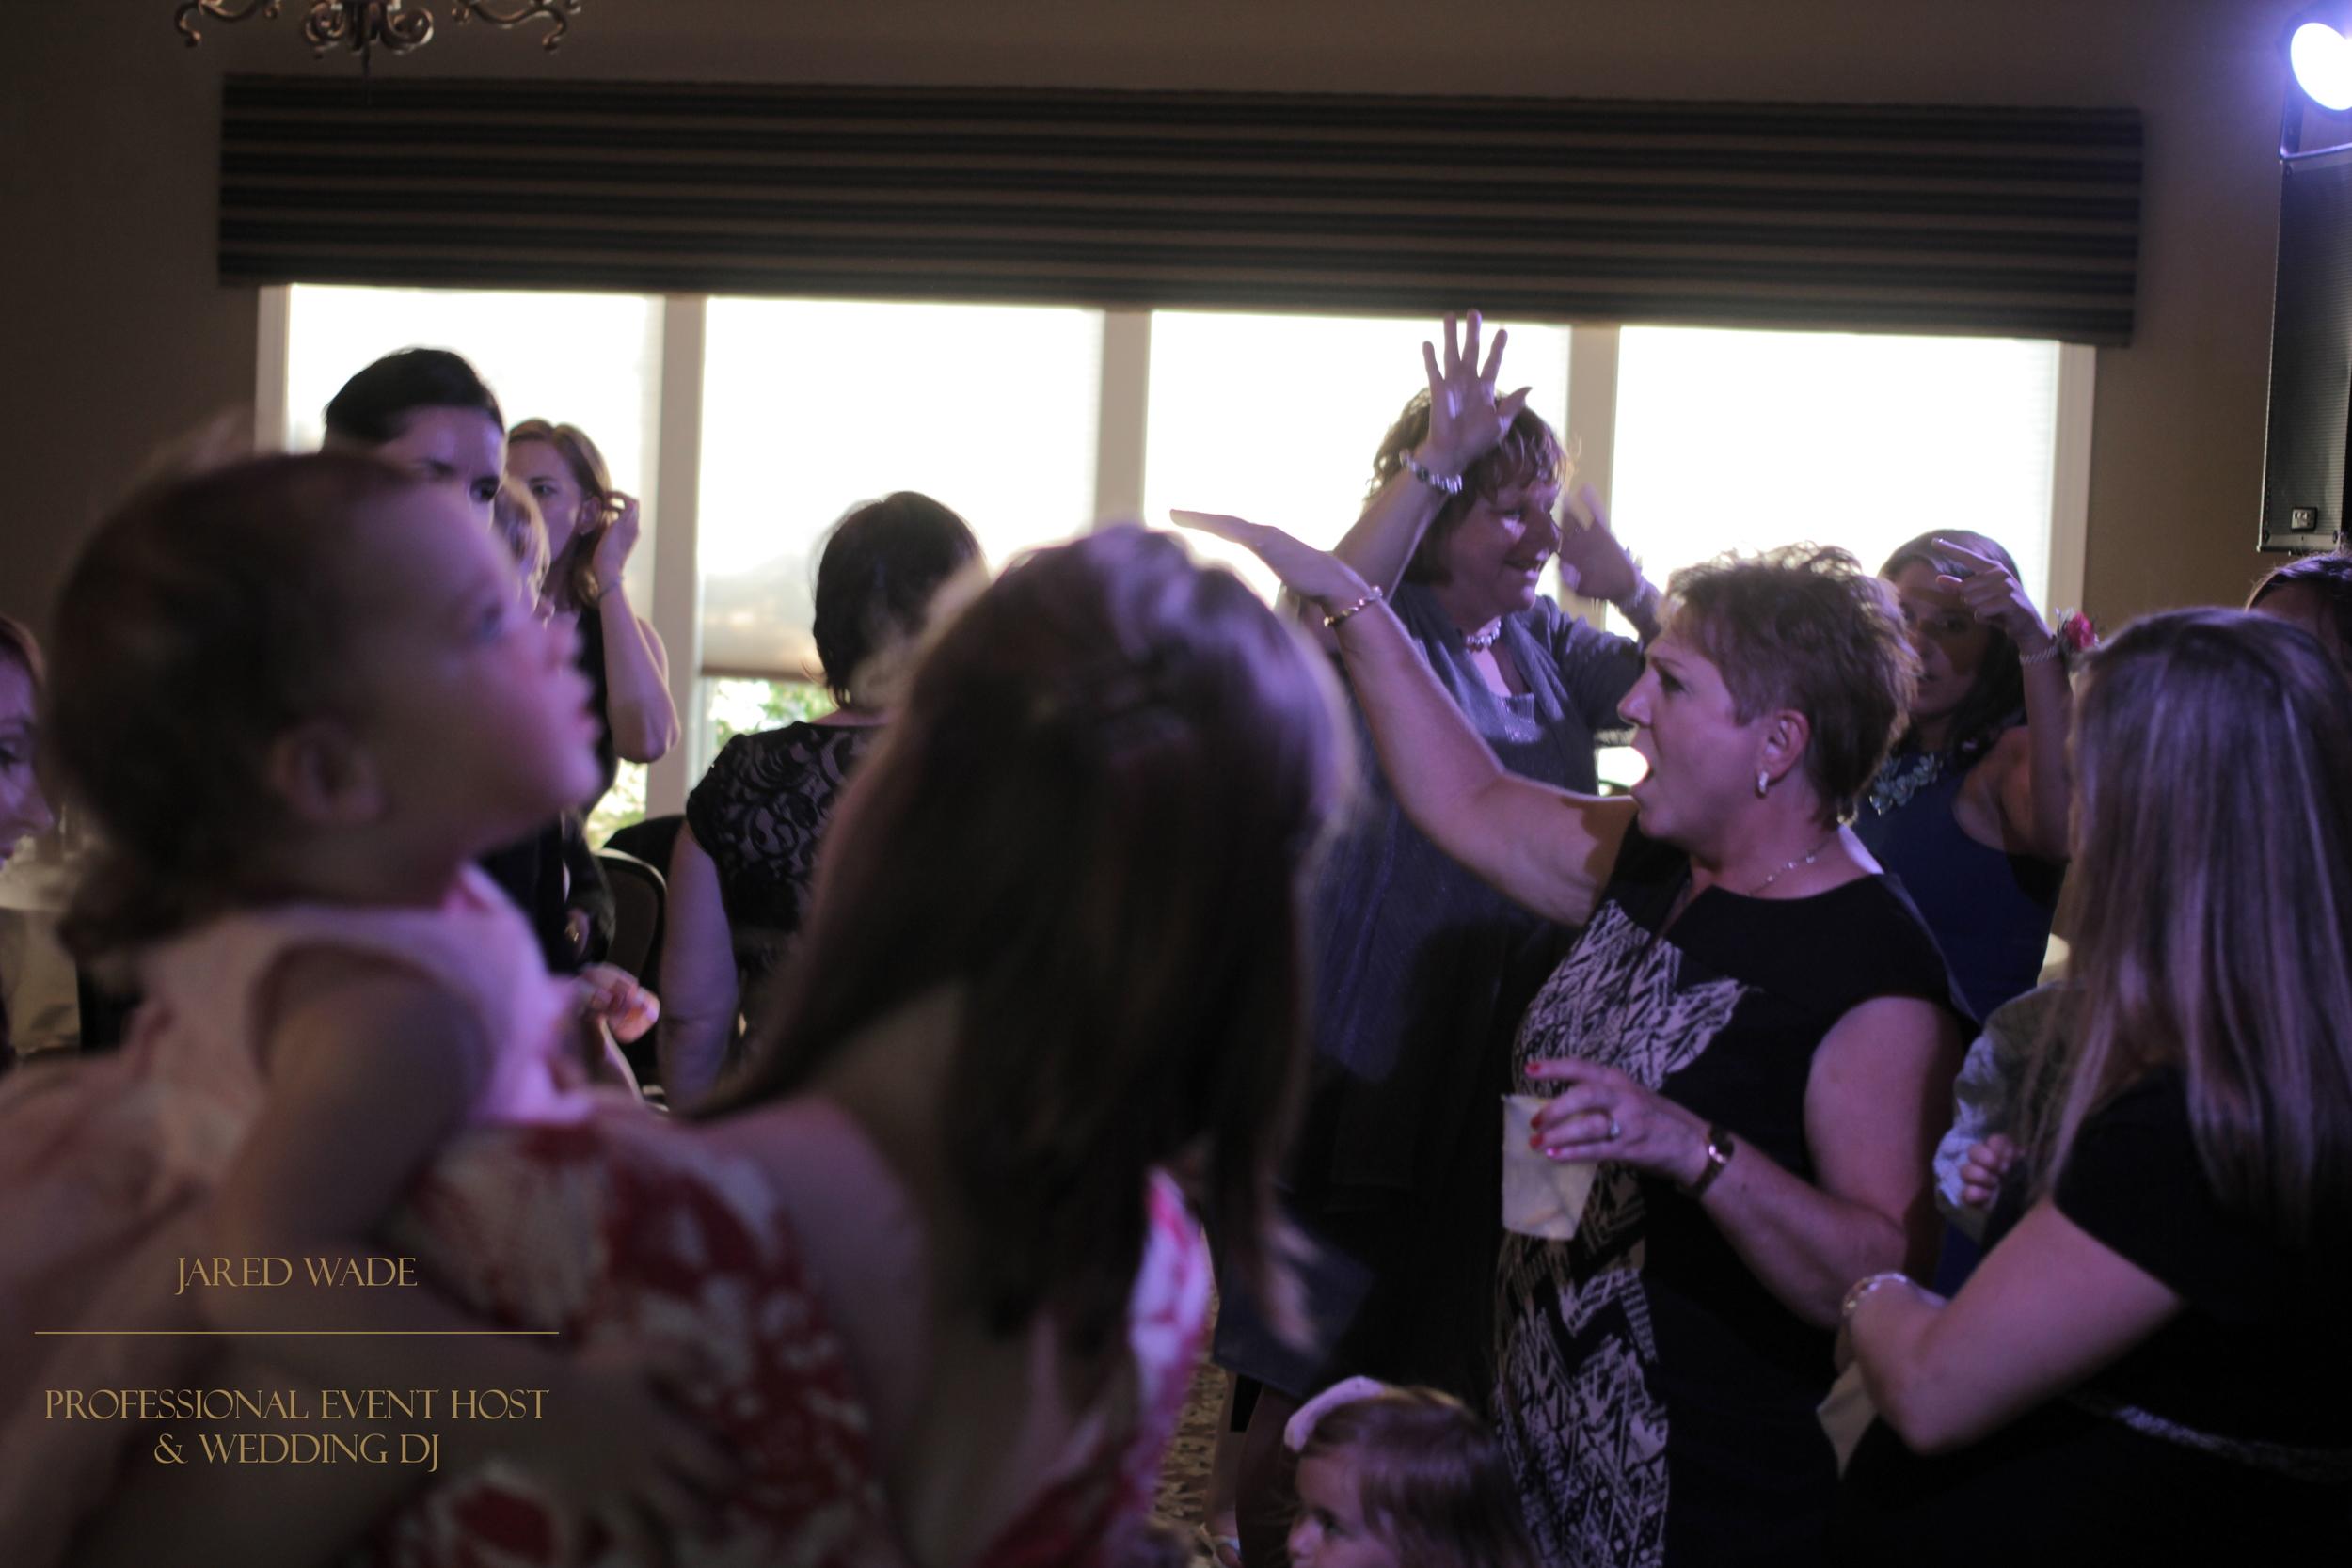 Jared Wade Professional Event Host   Wedding DJ   Indianapolis Indiana   Dyes Walk Country Club Wedding   Pinterest Wedding